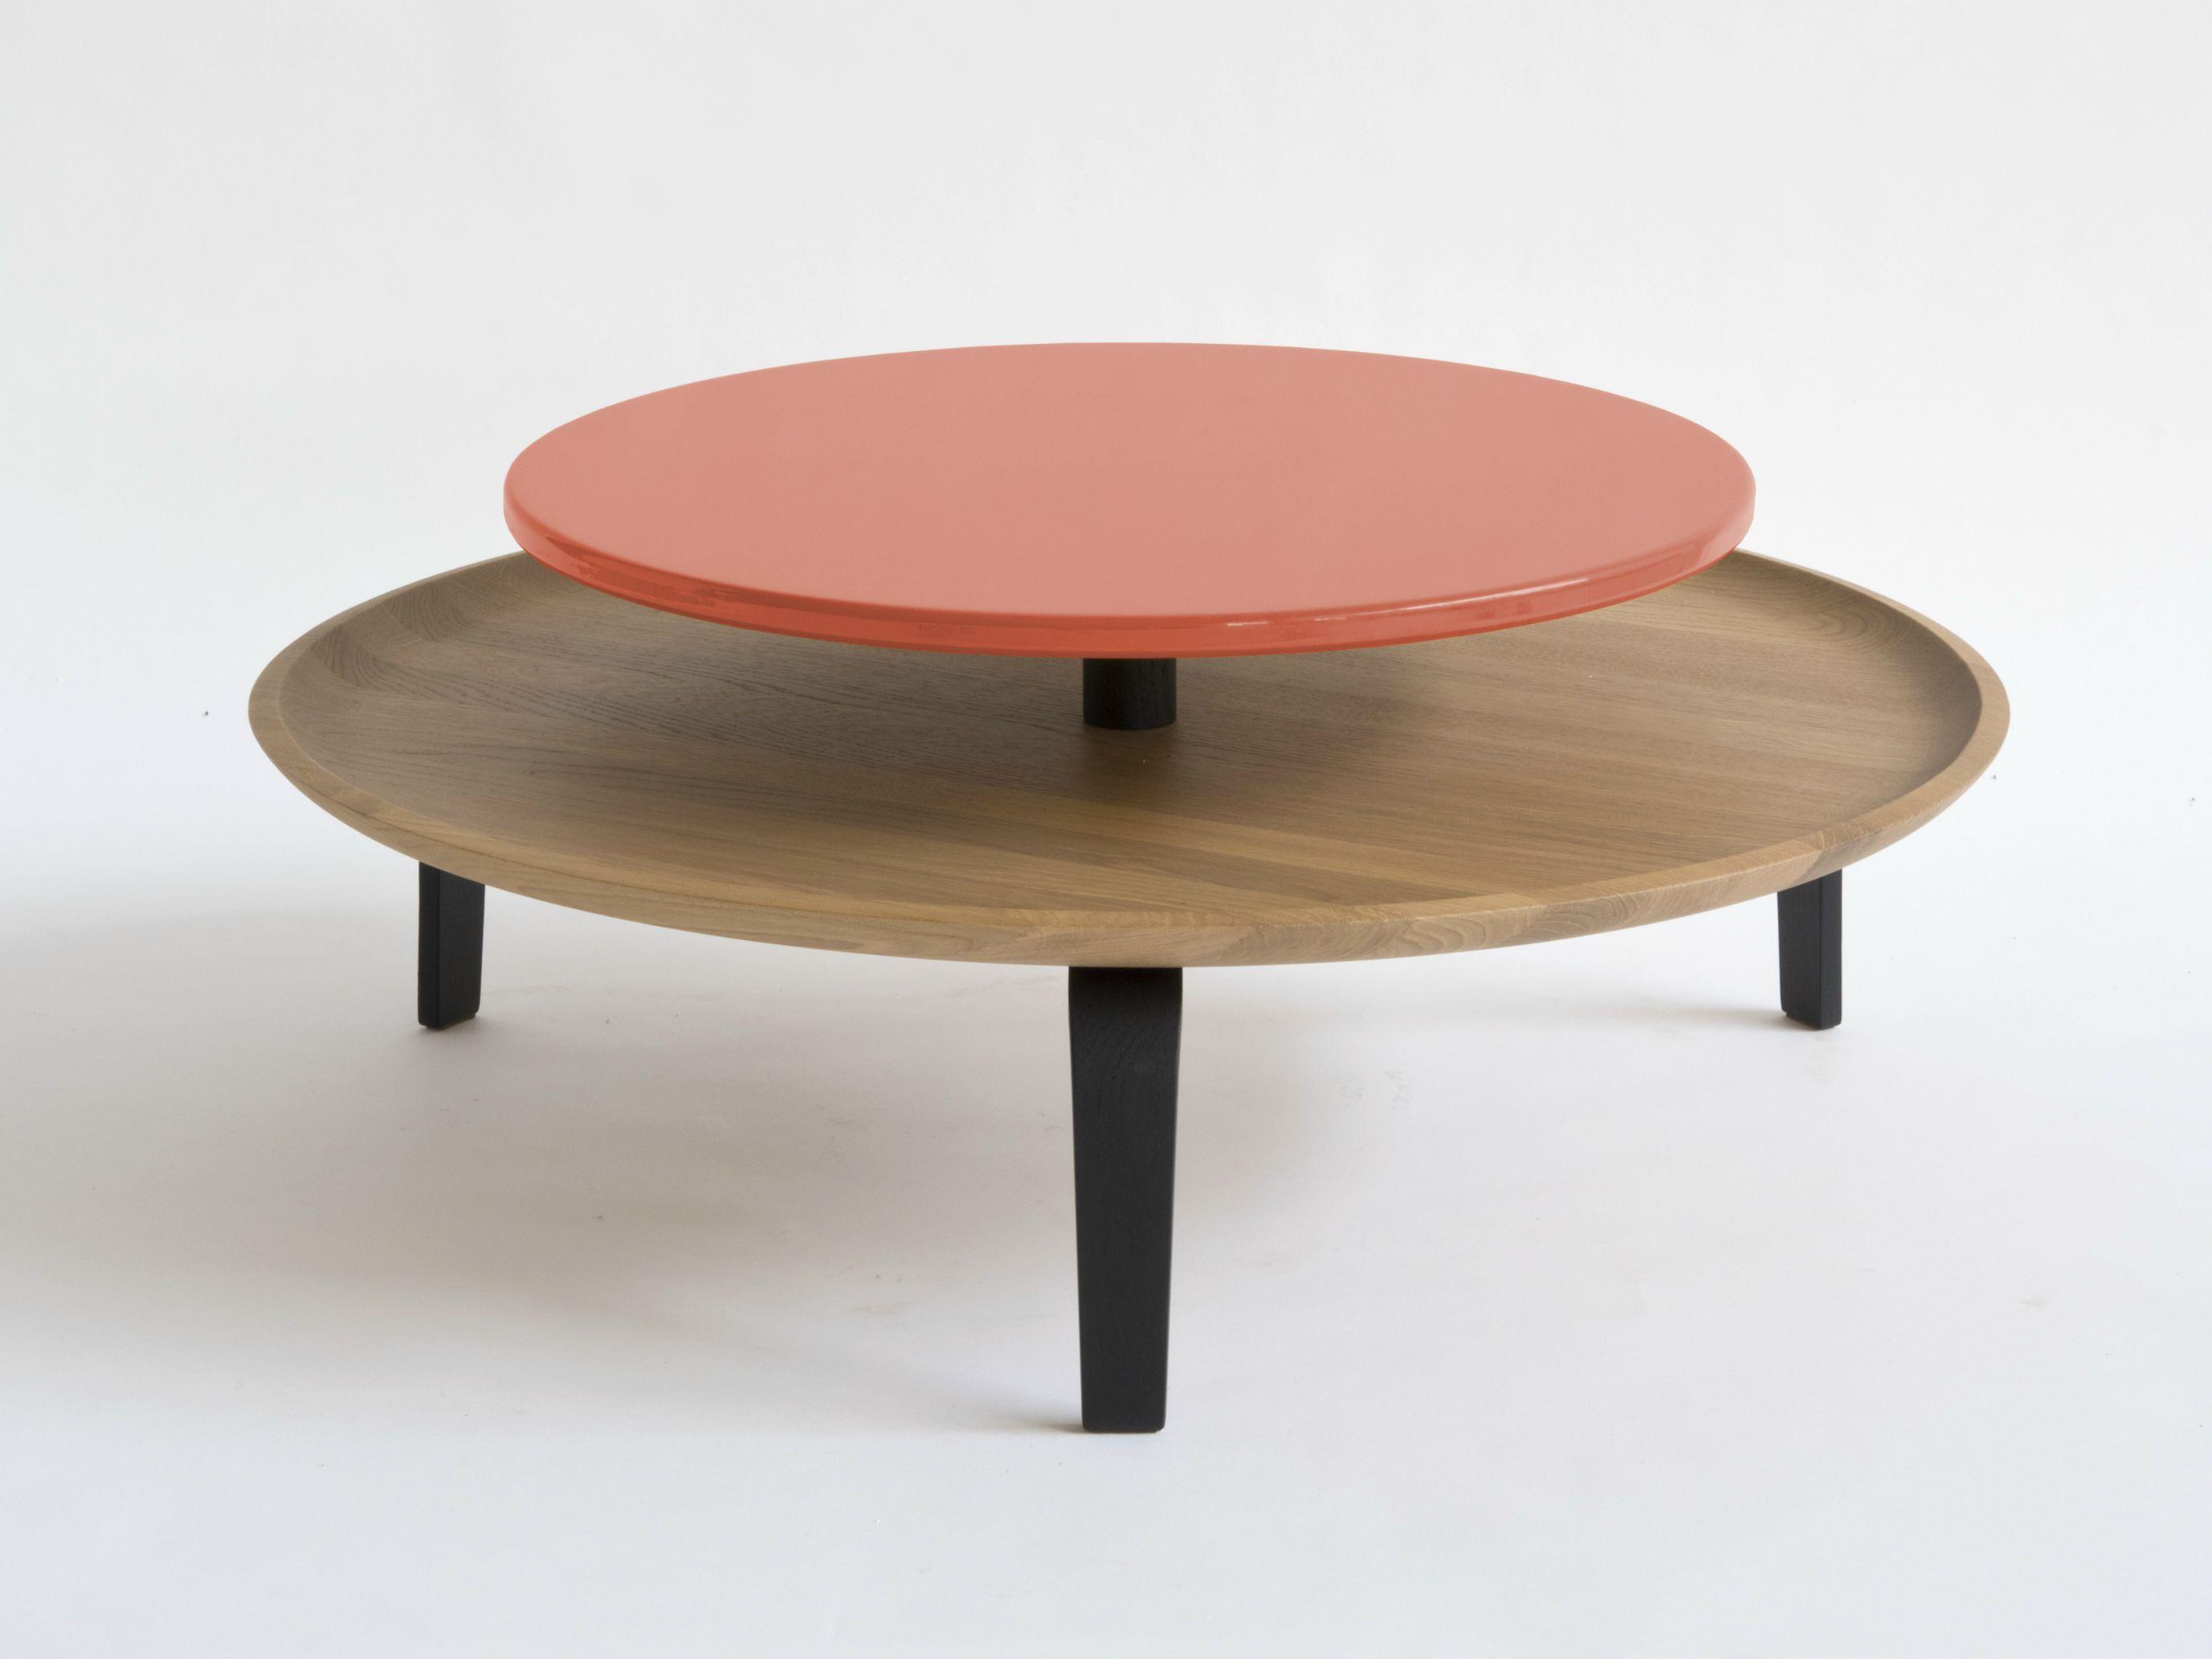 Low Round Coffee Table Secreto Collection By Cole Italian Design Label Design Lorenz Kaz Coffee Table Perfect Coffee Table Round Coffee Table [ 2065 x 2754 Pixel ]